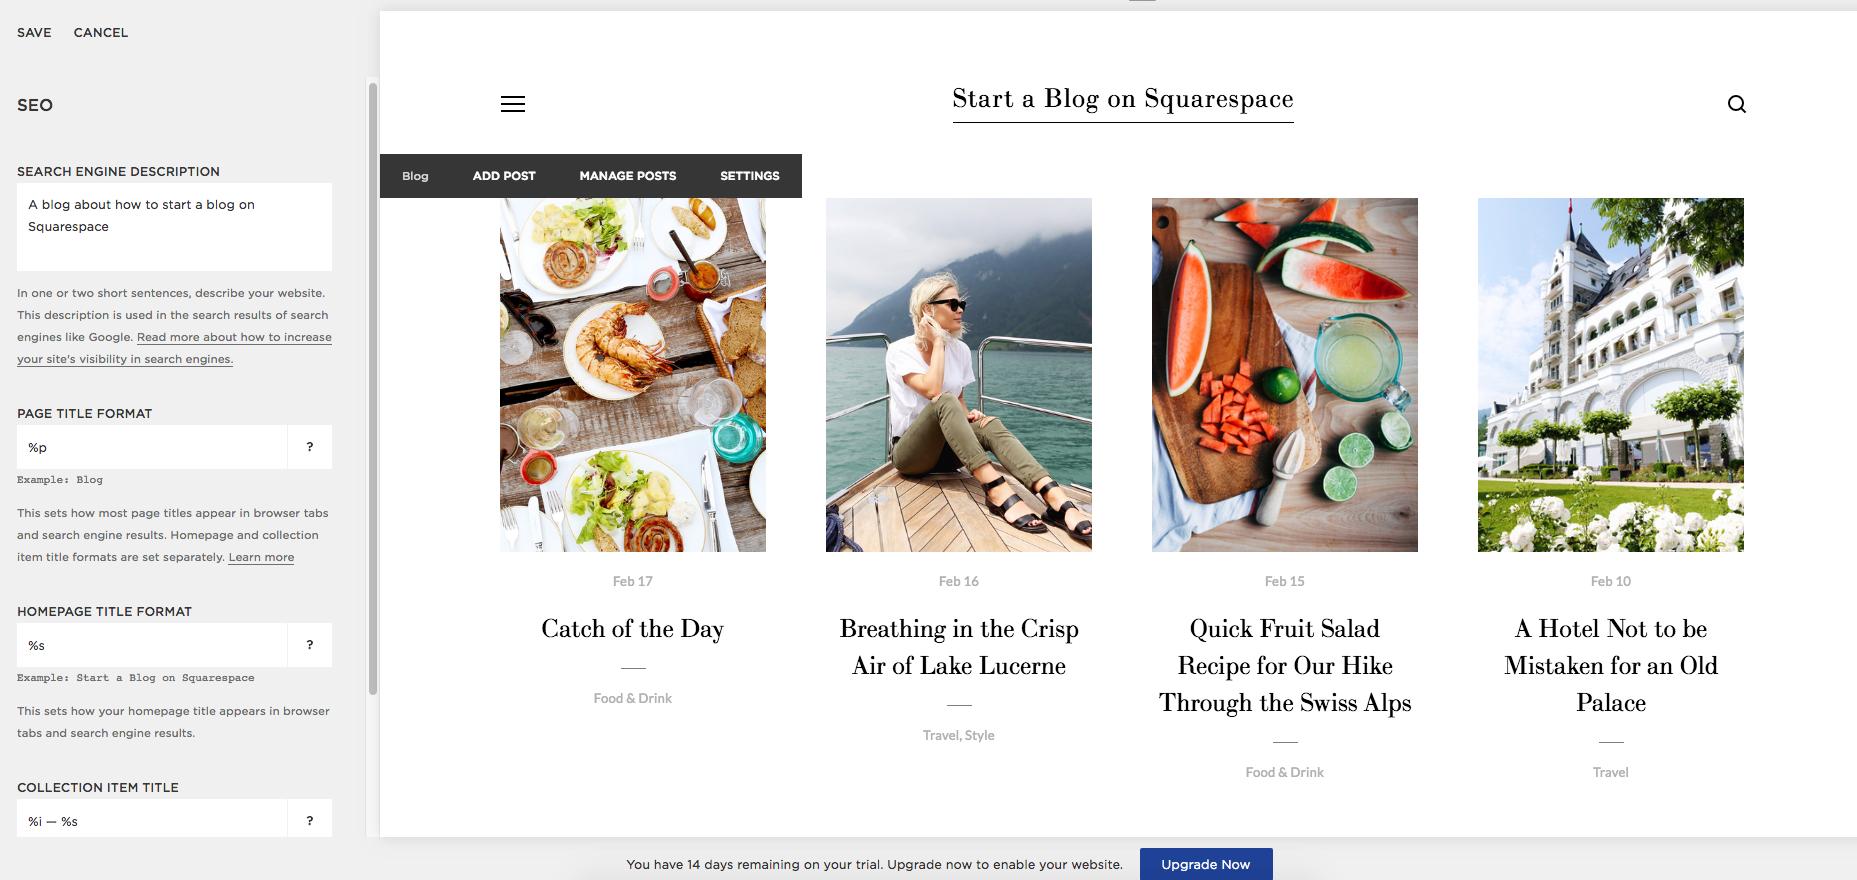 Settings > SEO > Write a keyword rich description of your blog.